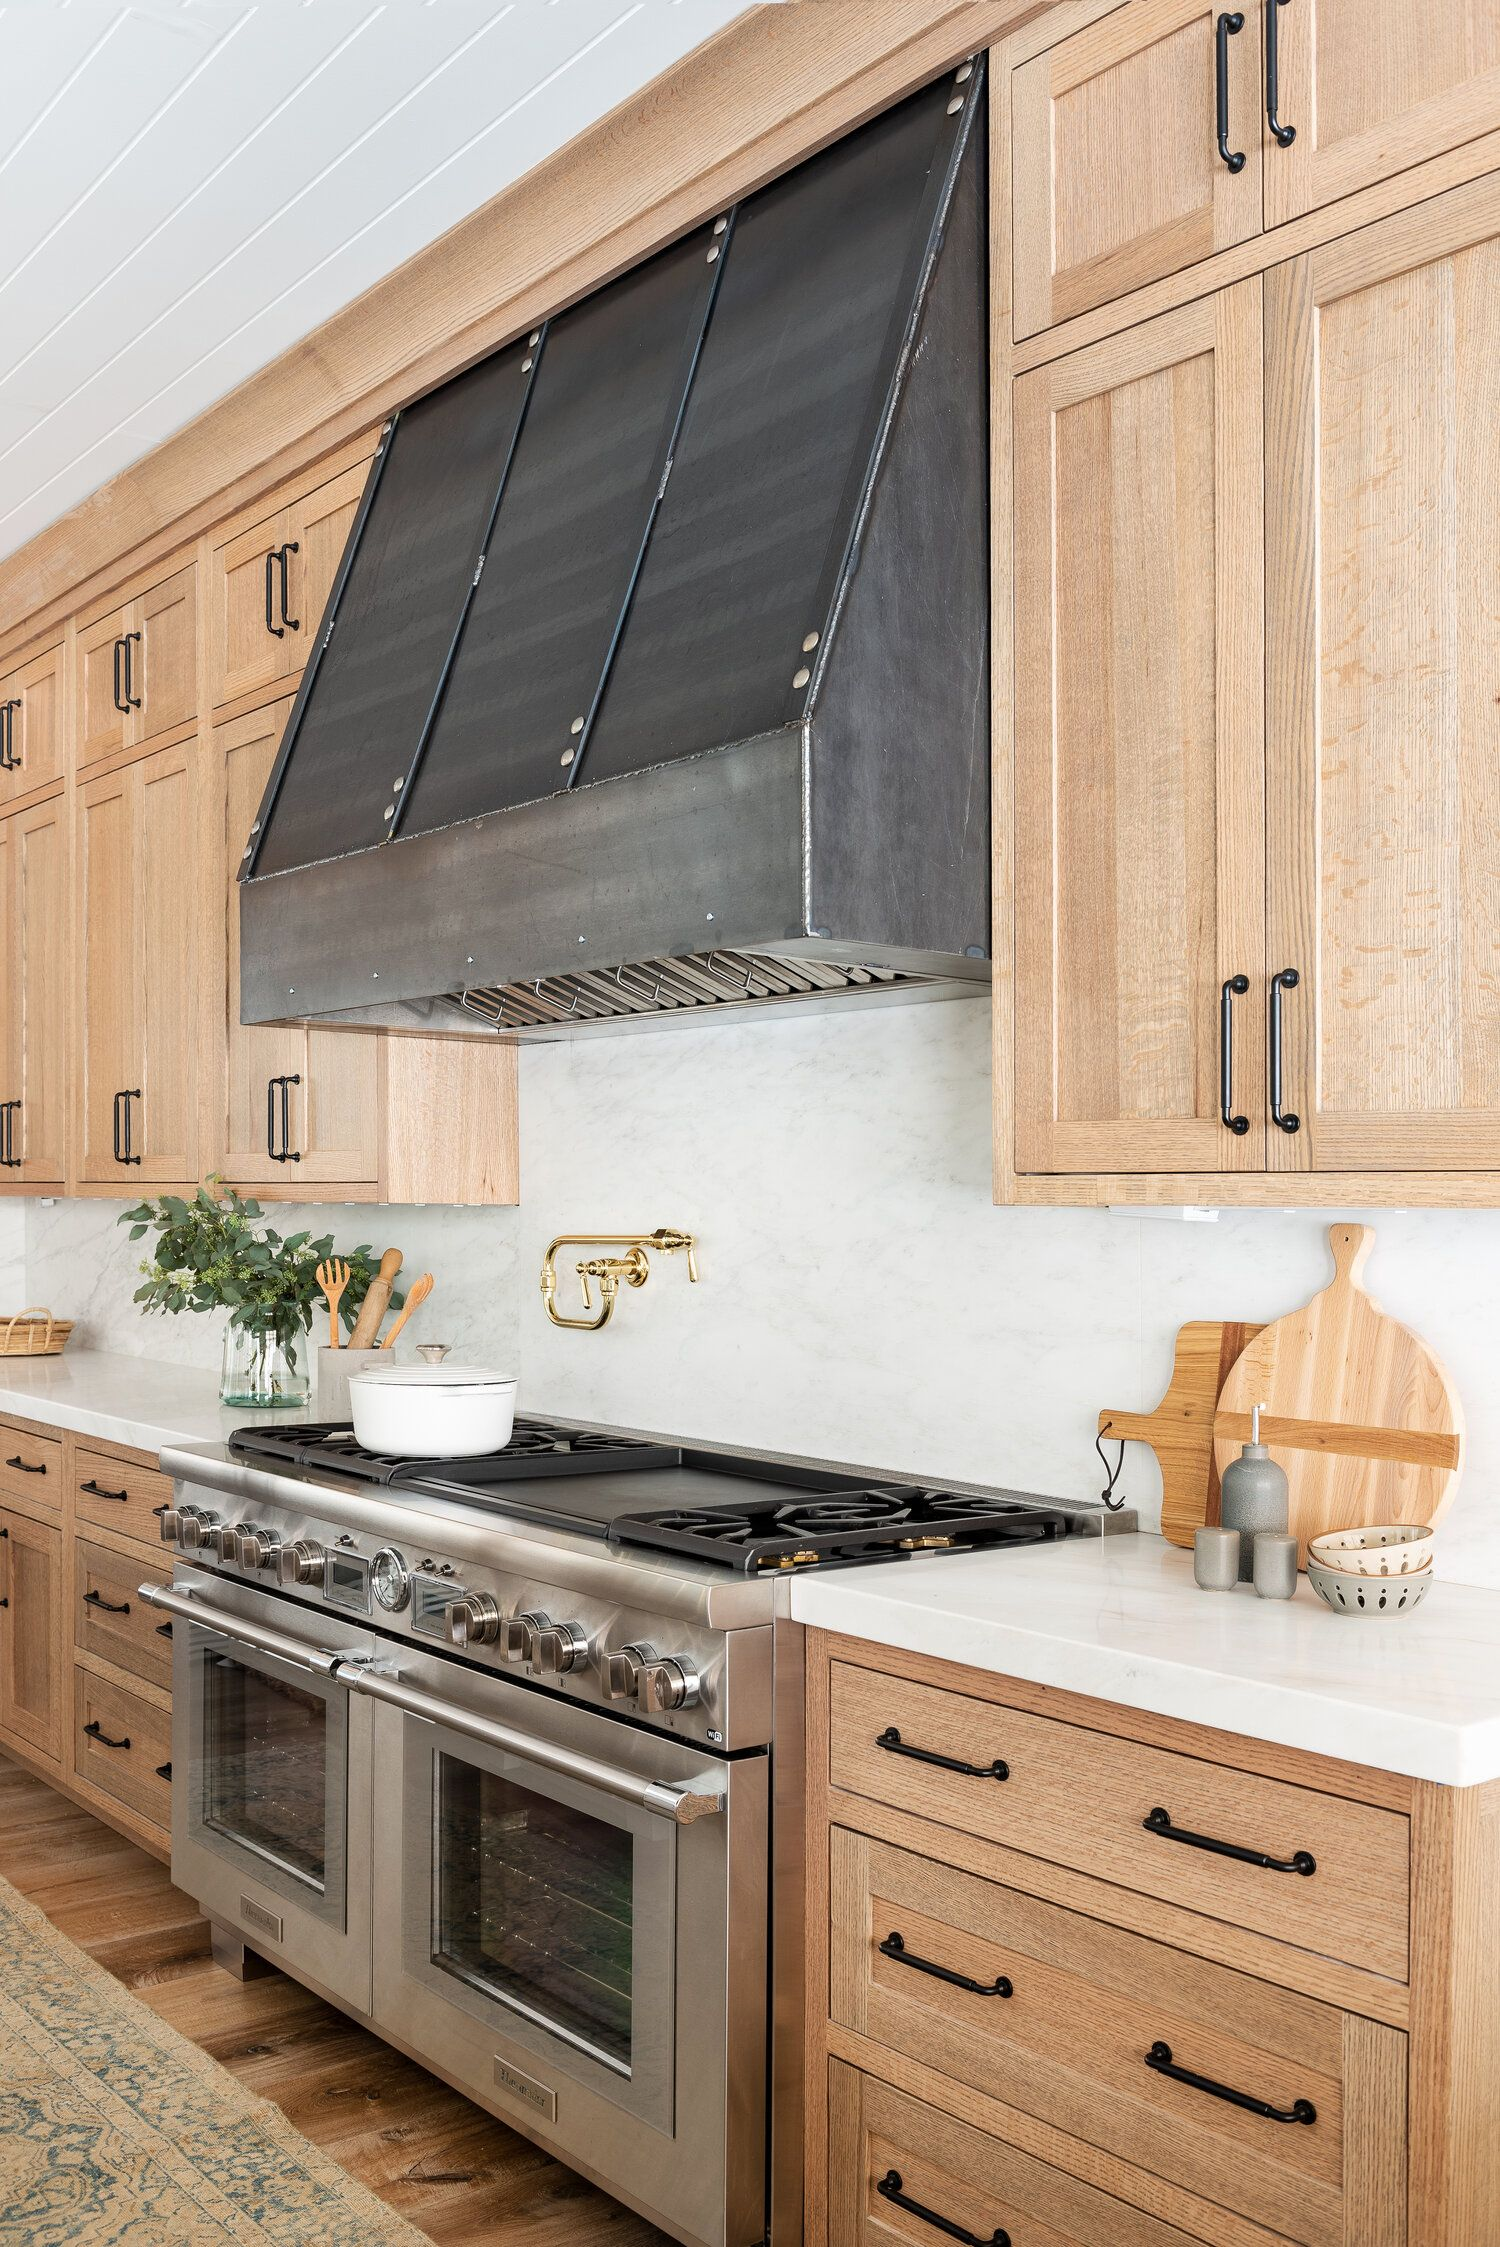 Natural Wood Kitchen Design Studio Mcgee Latest Kitchen Designs Kitchen Interior Home Decor Kitchen